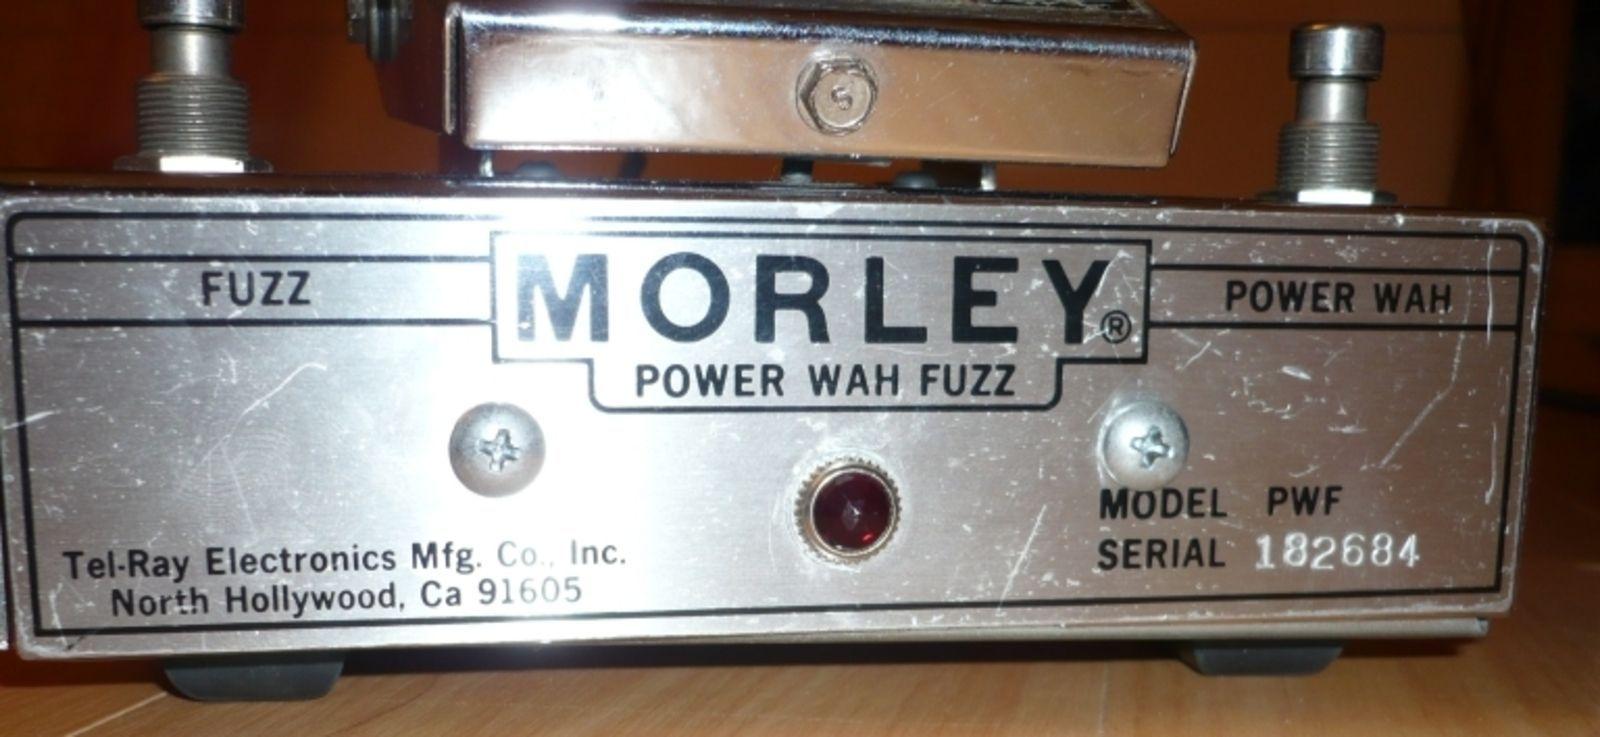 morley power wah fuzz image 11801 audiofanzine. Black Bedroom Furniture Sets. Home Design Ideas